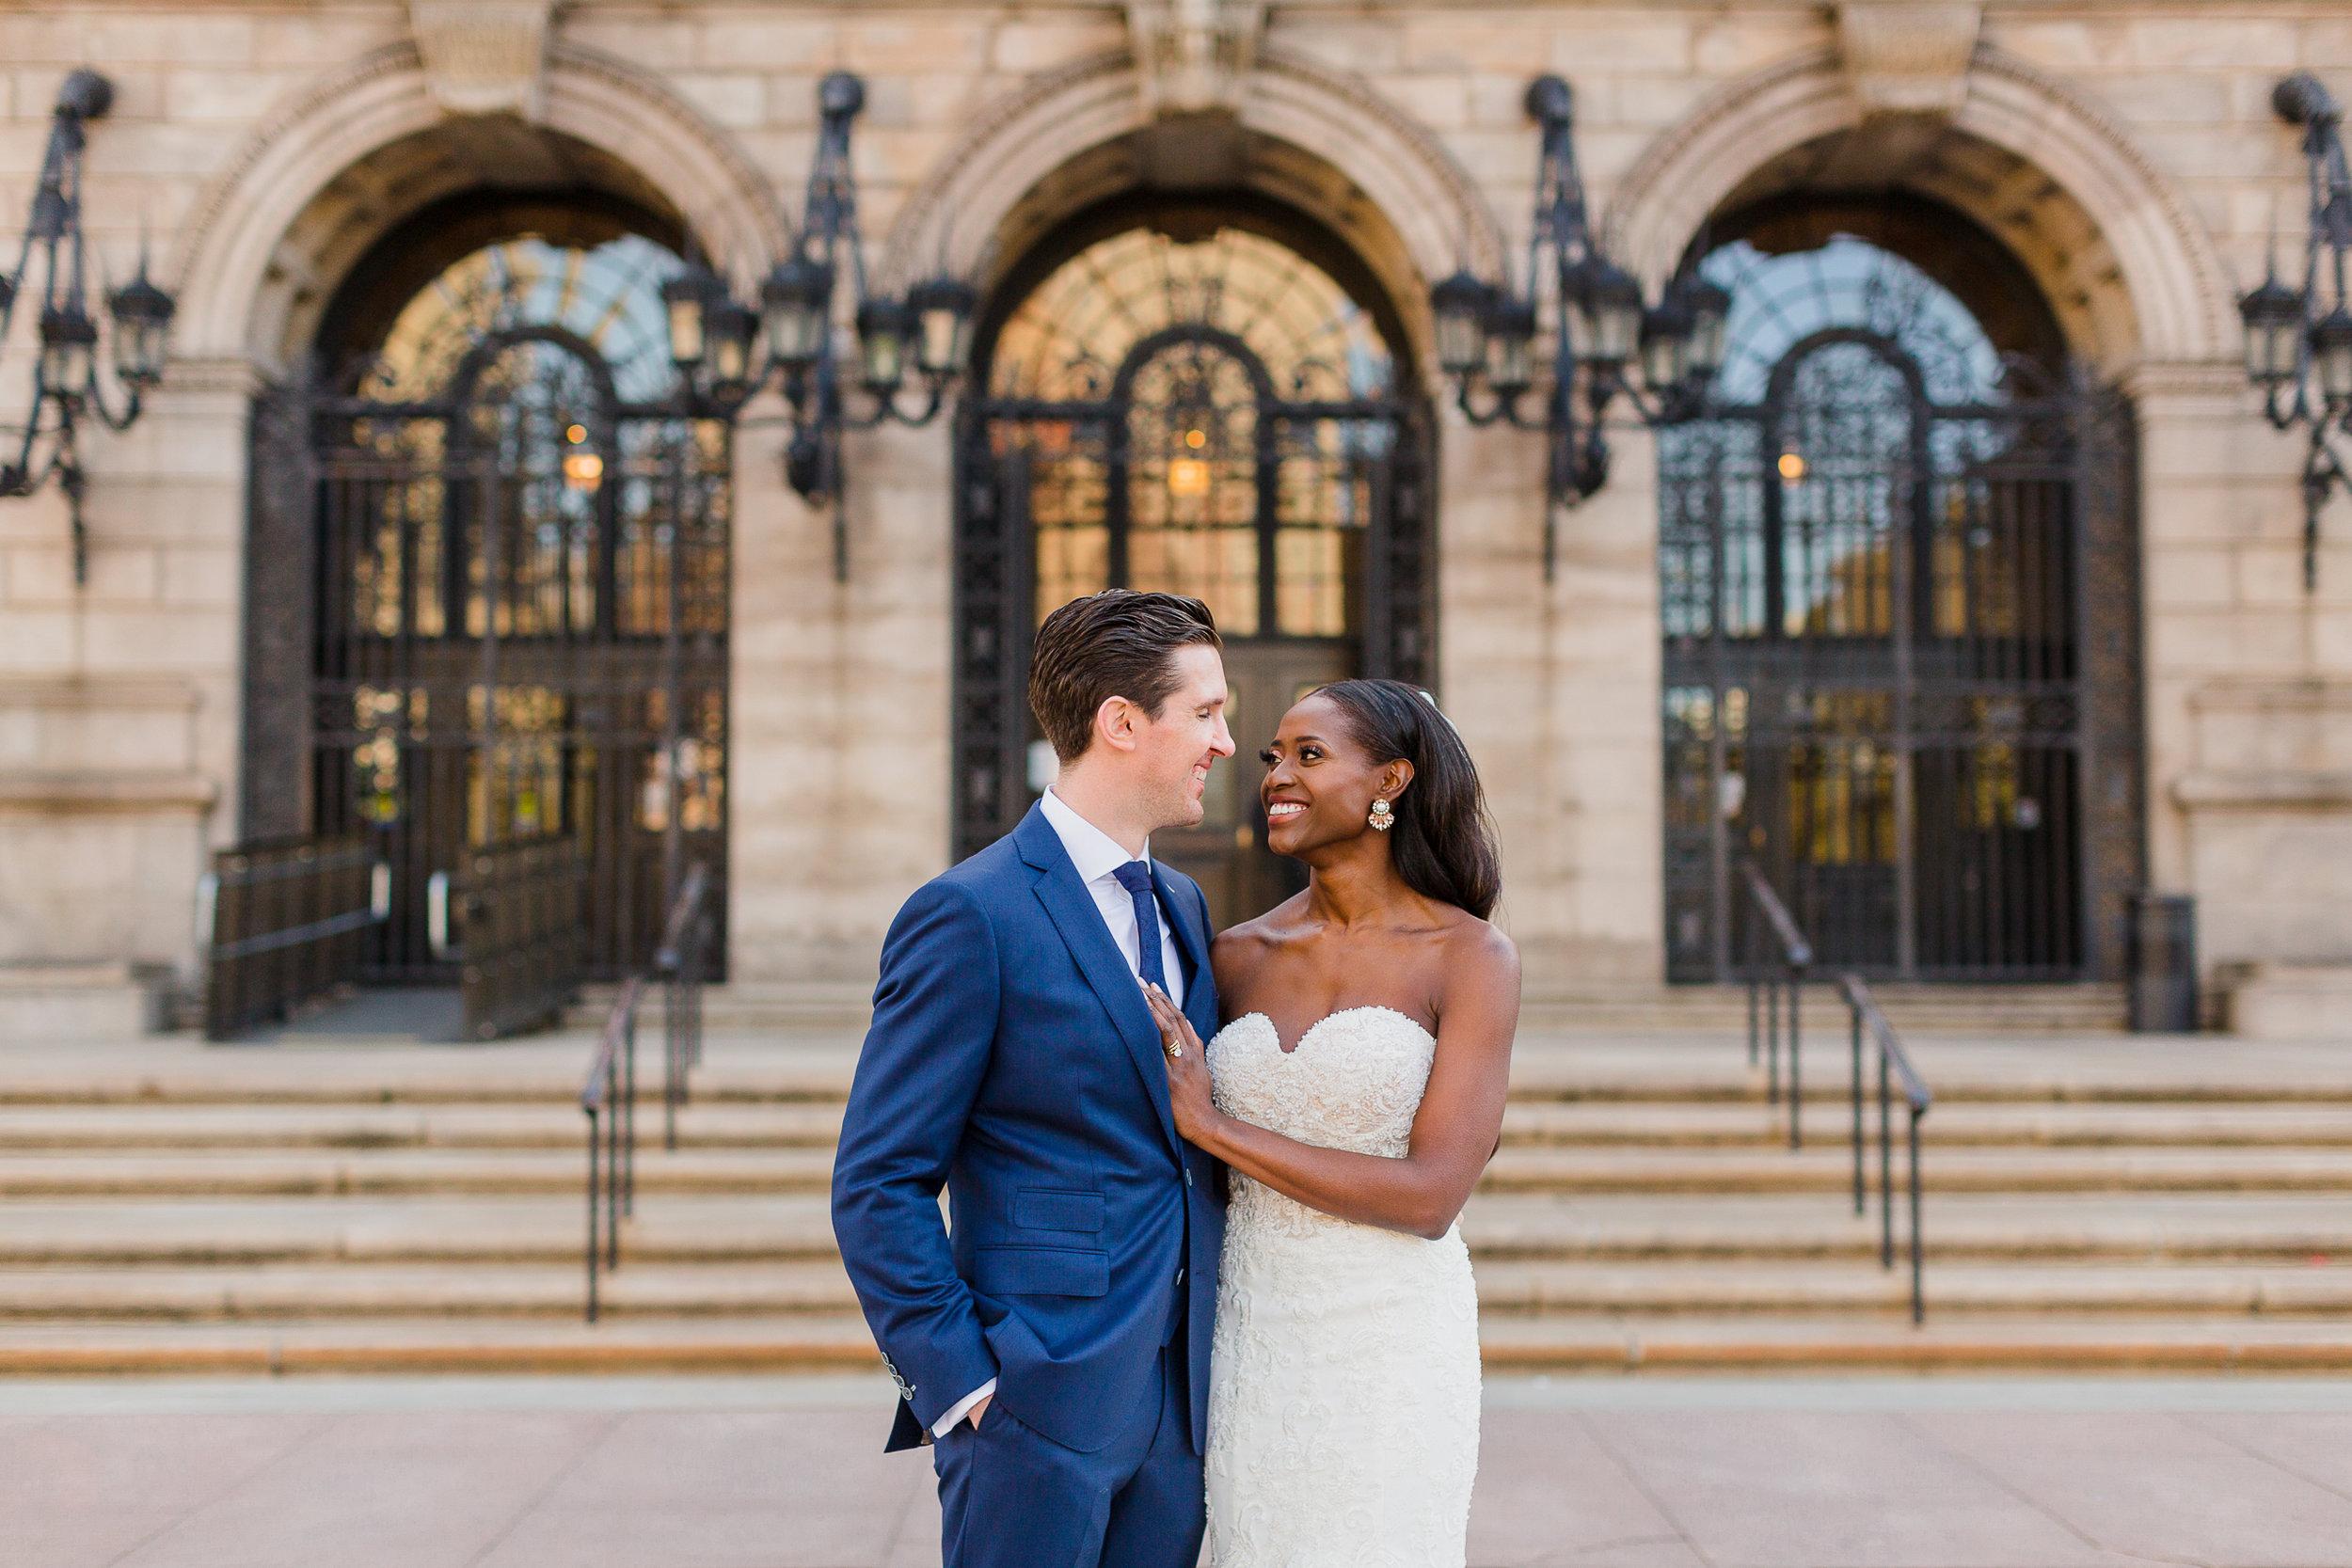 fairmont-copley-plaza-wedding-photos-00730.JPG